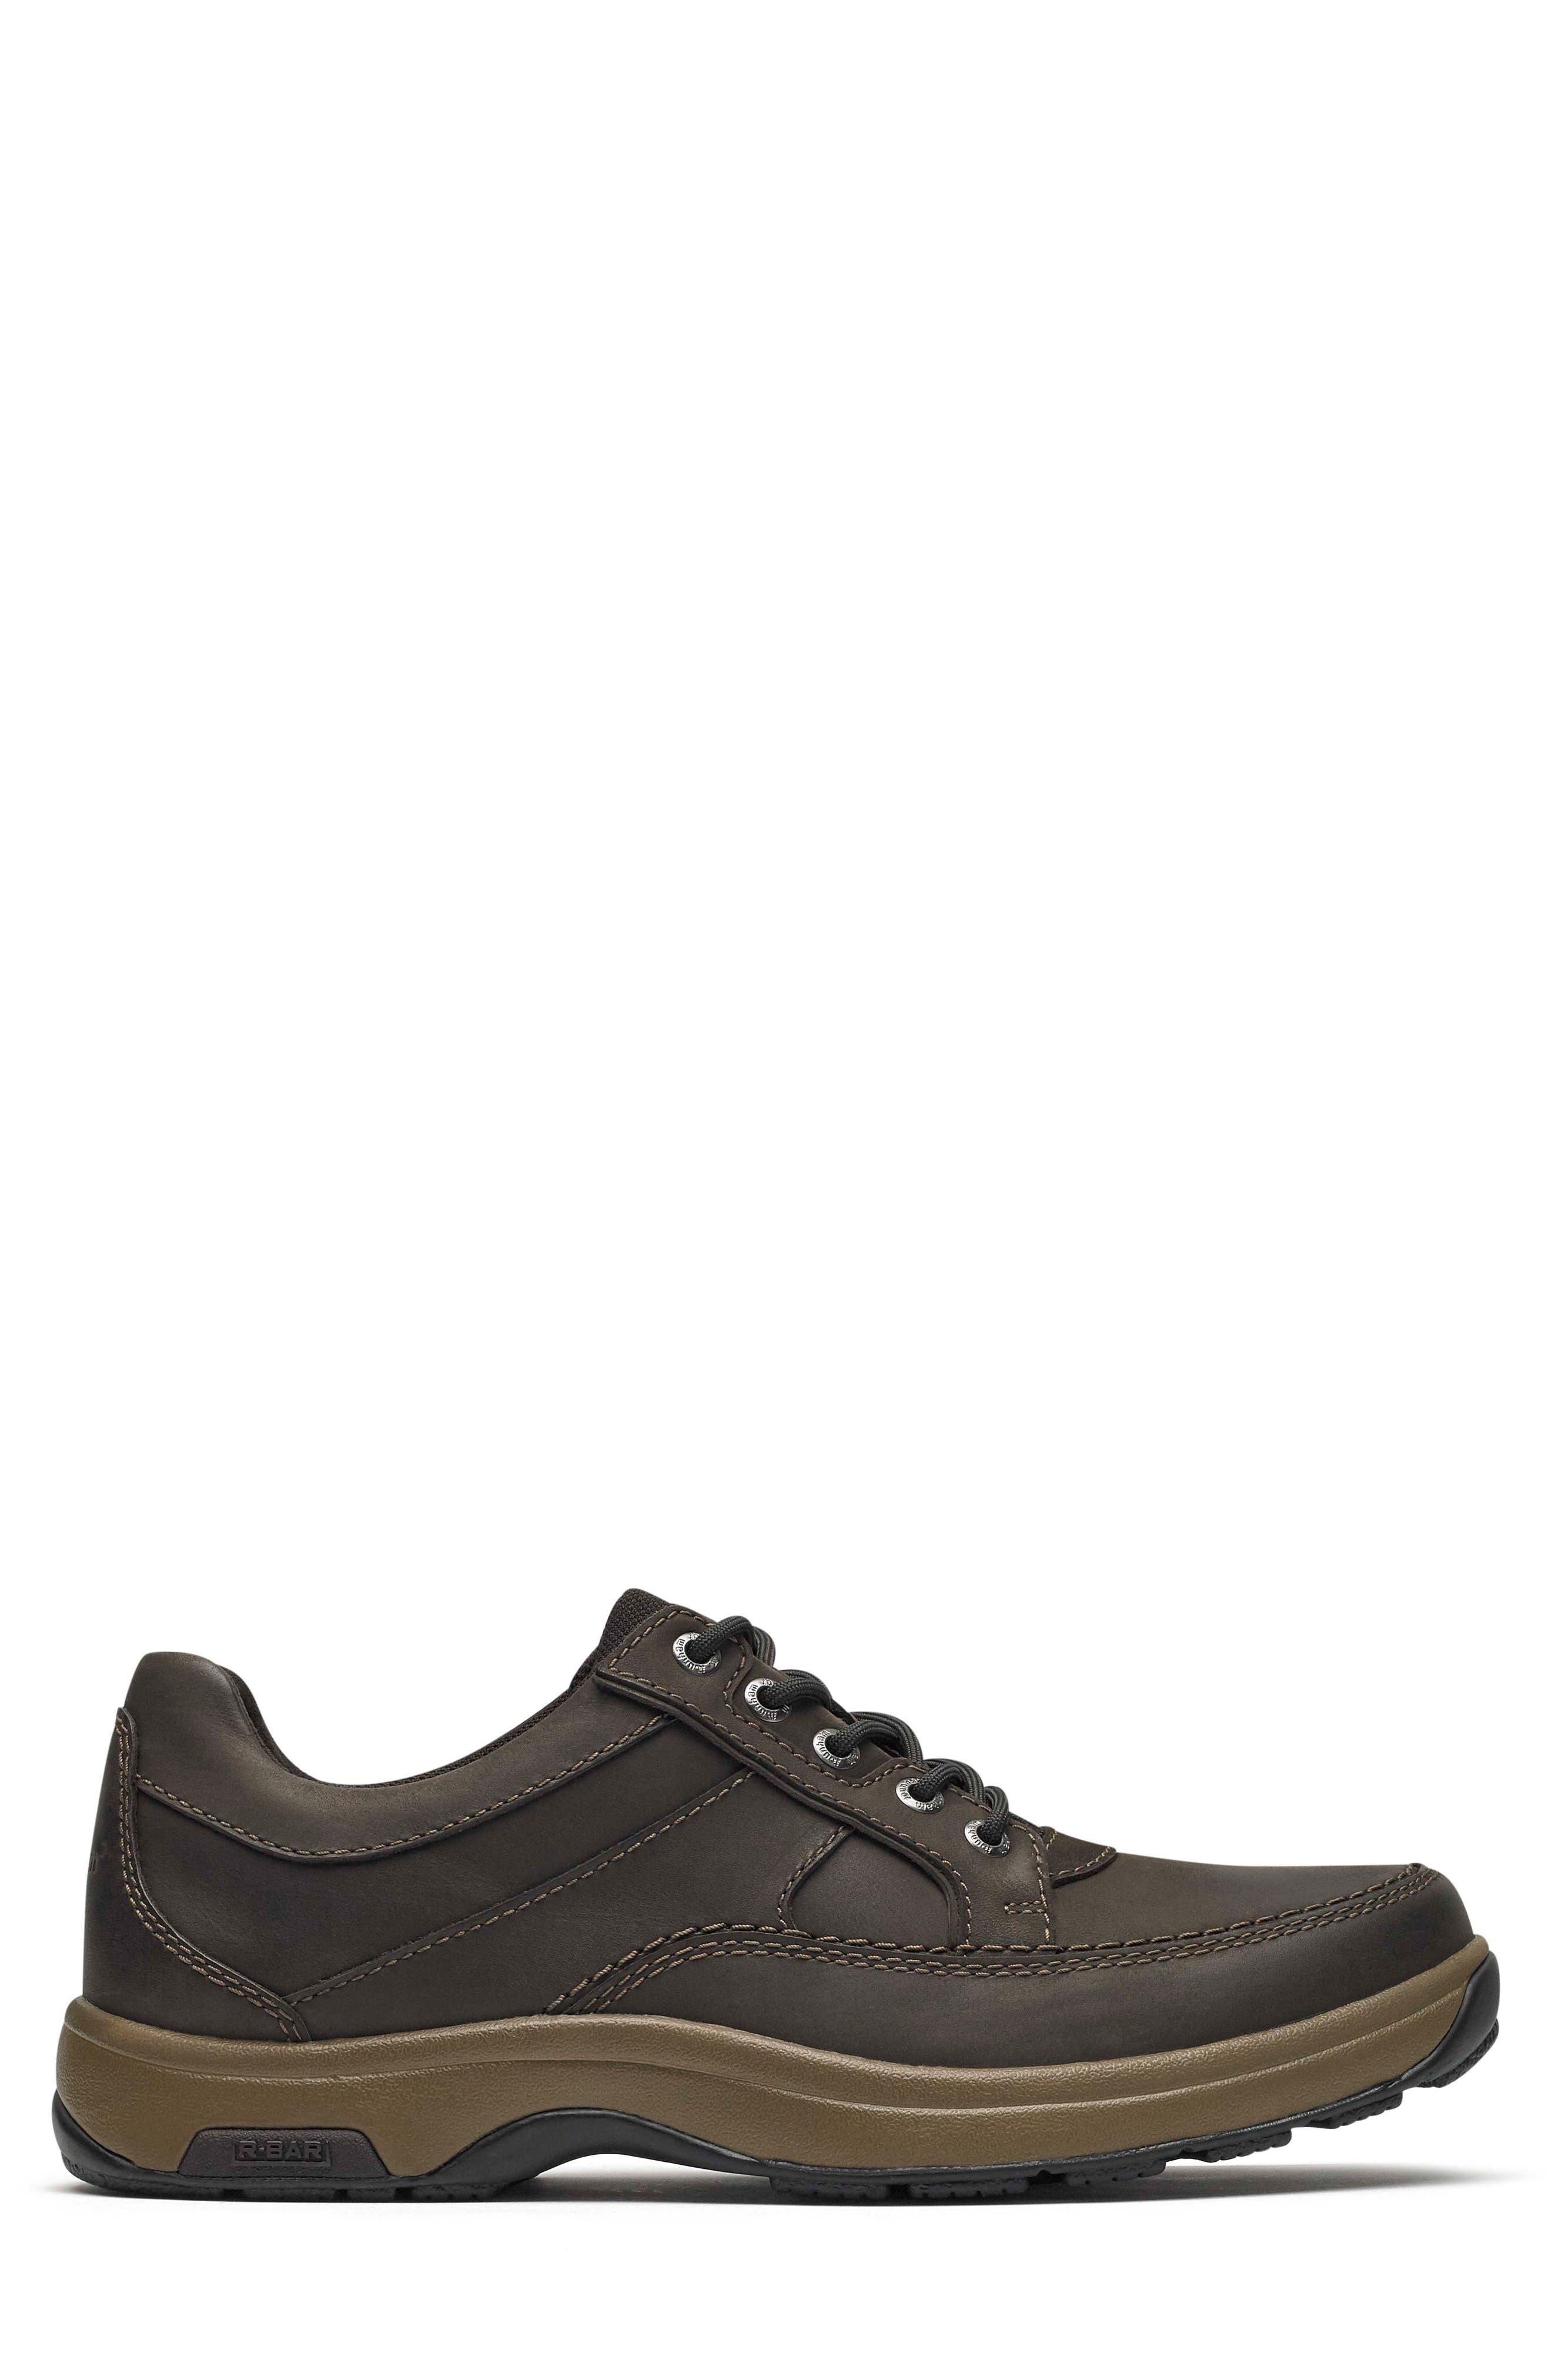 DUNHAM, 'Midland' Sneaker, Alternate thumbnail 3, color, BROWN LEATHER